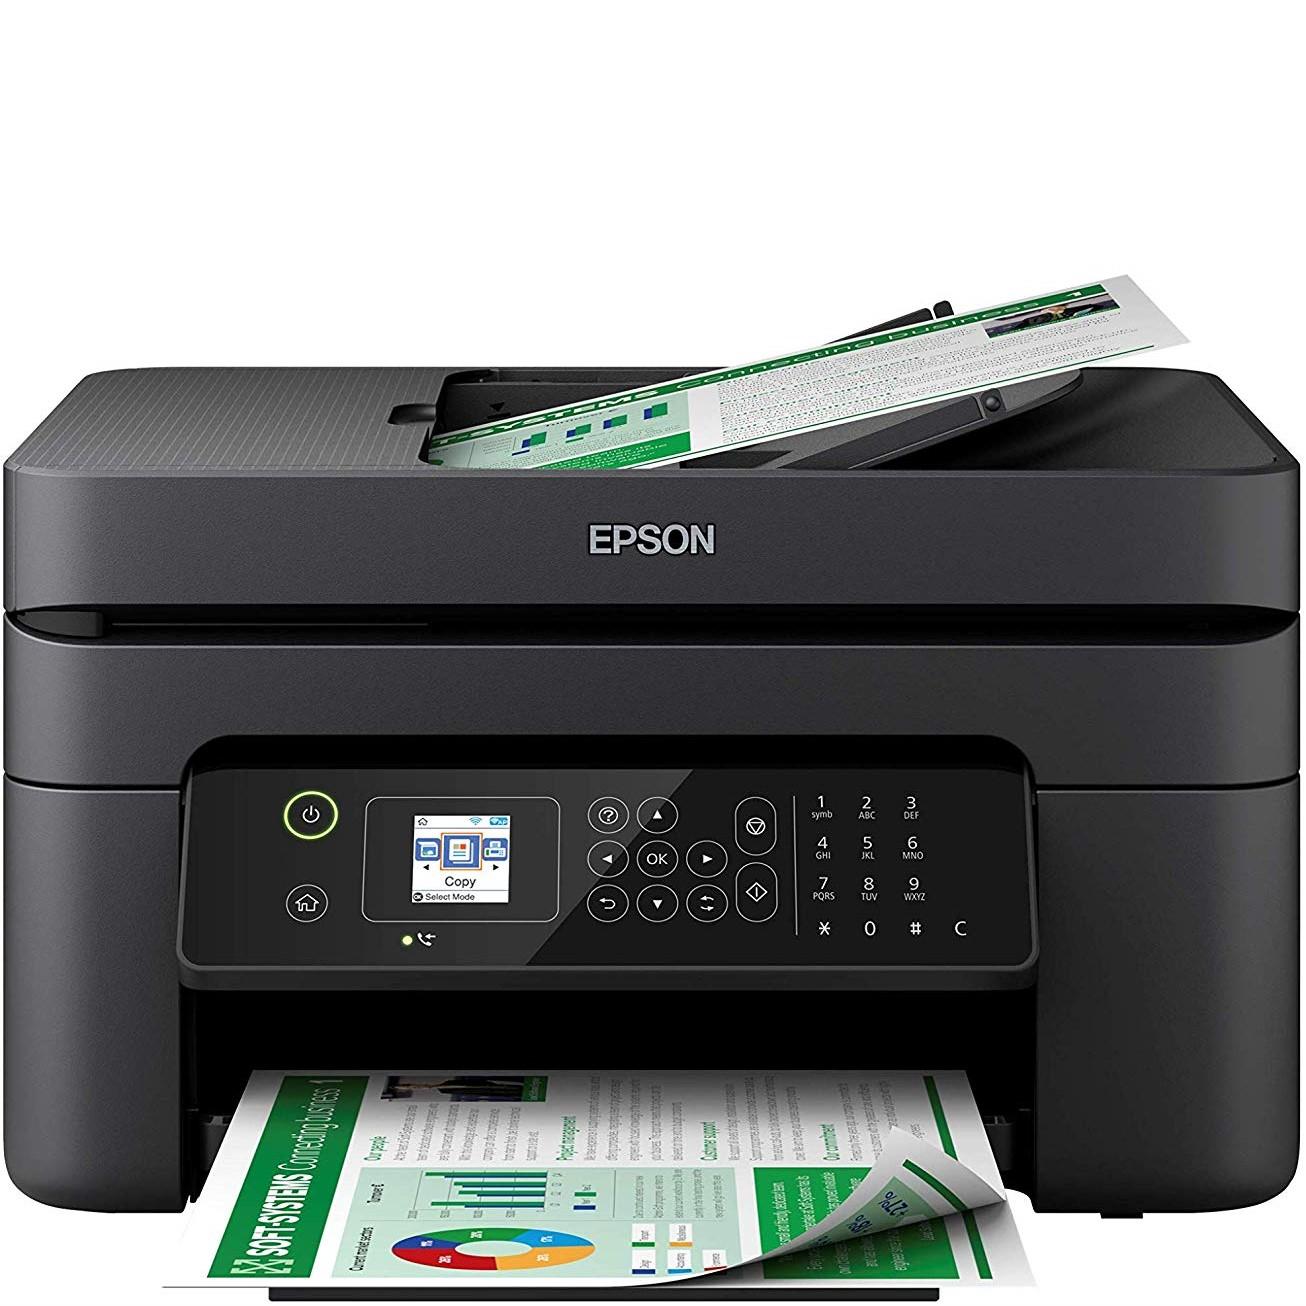 Epson WorkForce WF2830 Inkjet